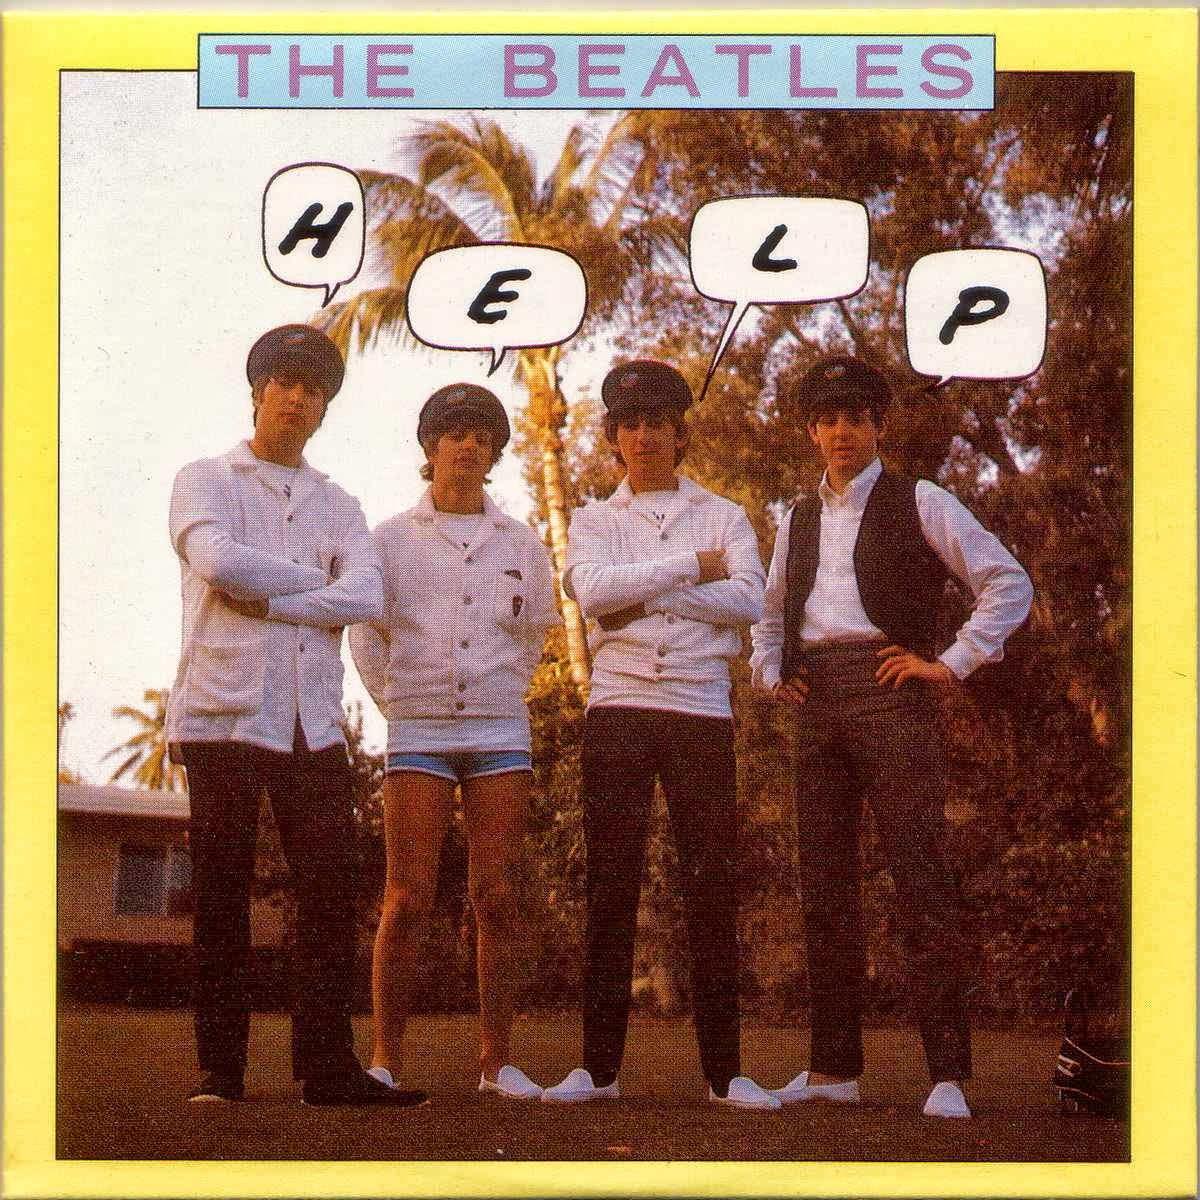 Tan Sólo Música : The Beatles (1965) - Help! (45 rpm)